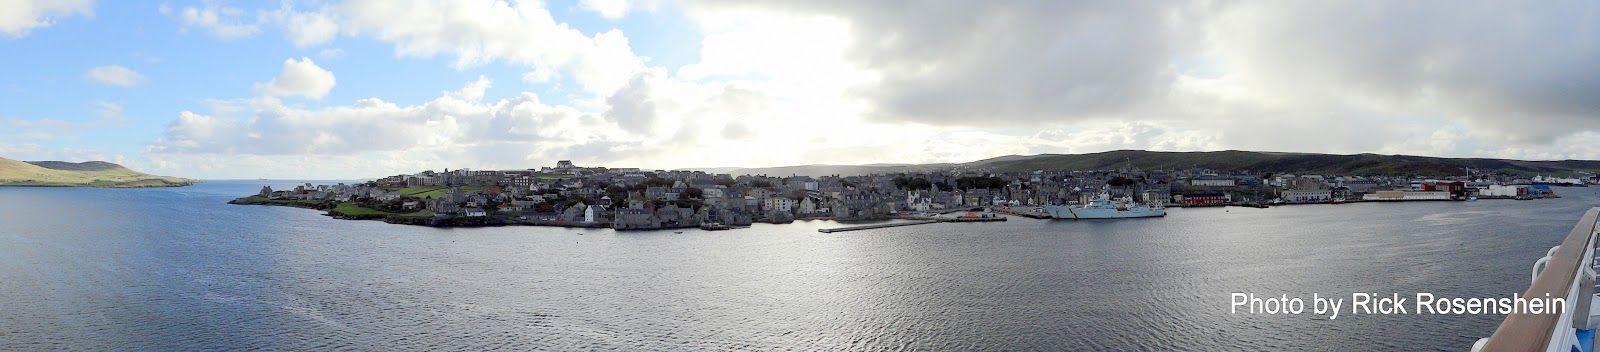 Lerwick, Shetland Islands #shetlandislands Lerwick, Shetland Islands #shetlandislands